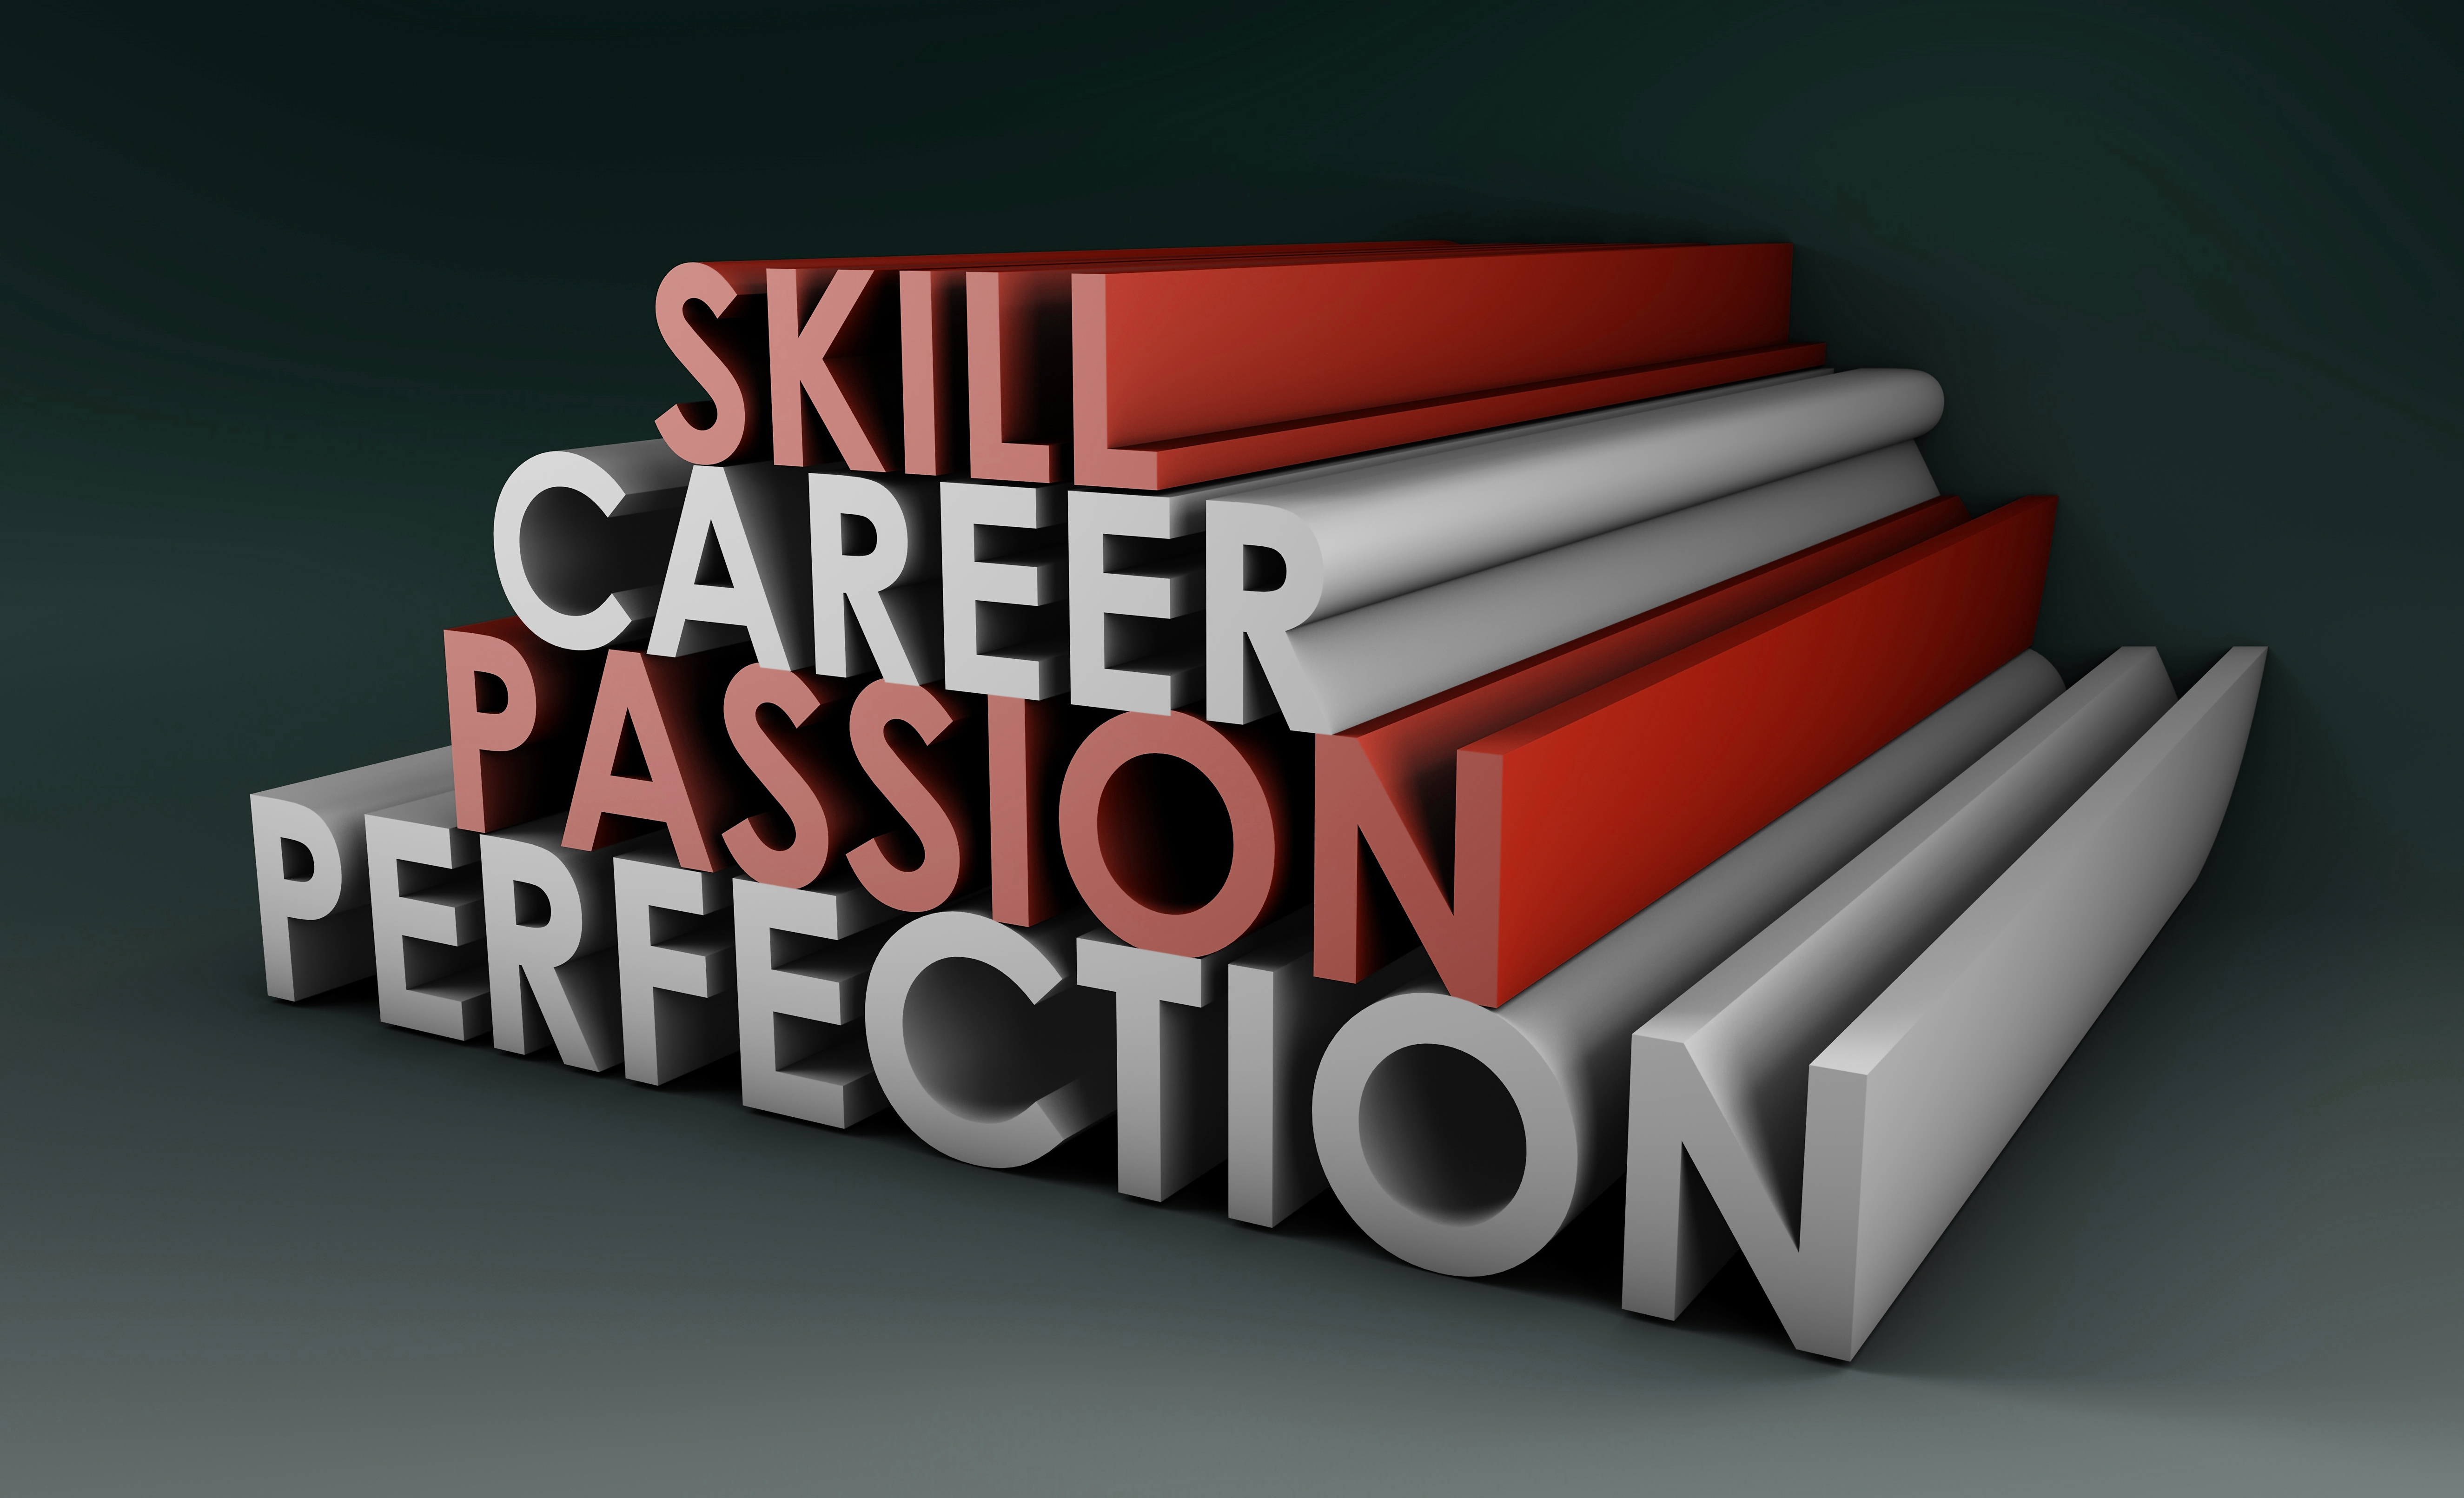 passion at work quotes  quotesgram